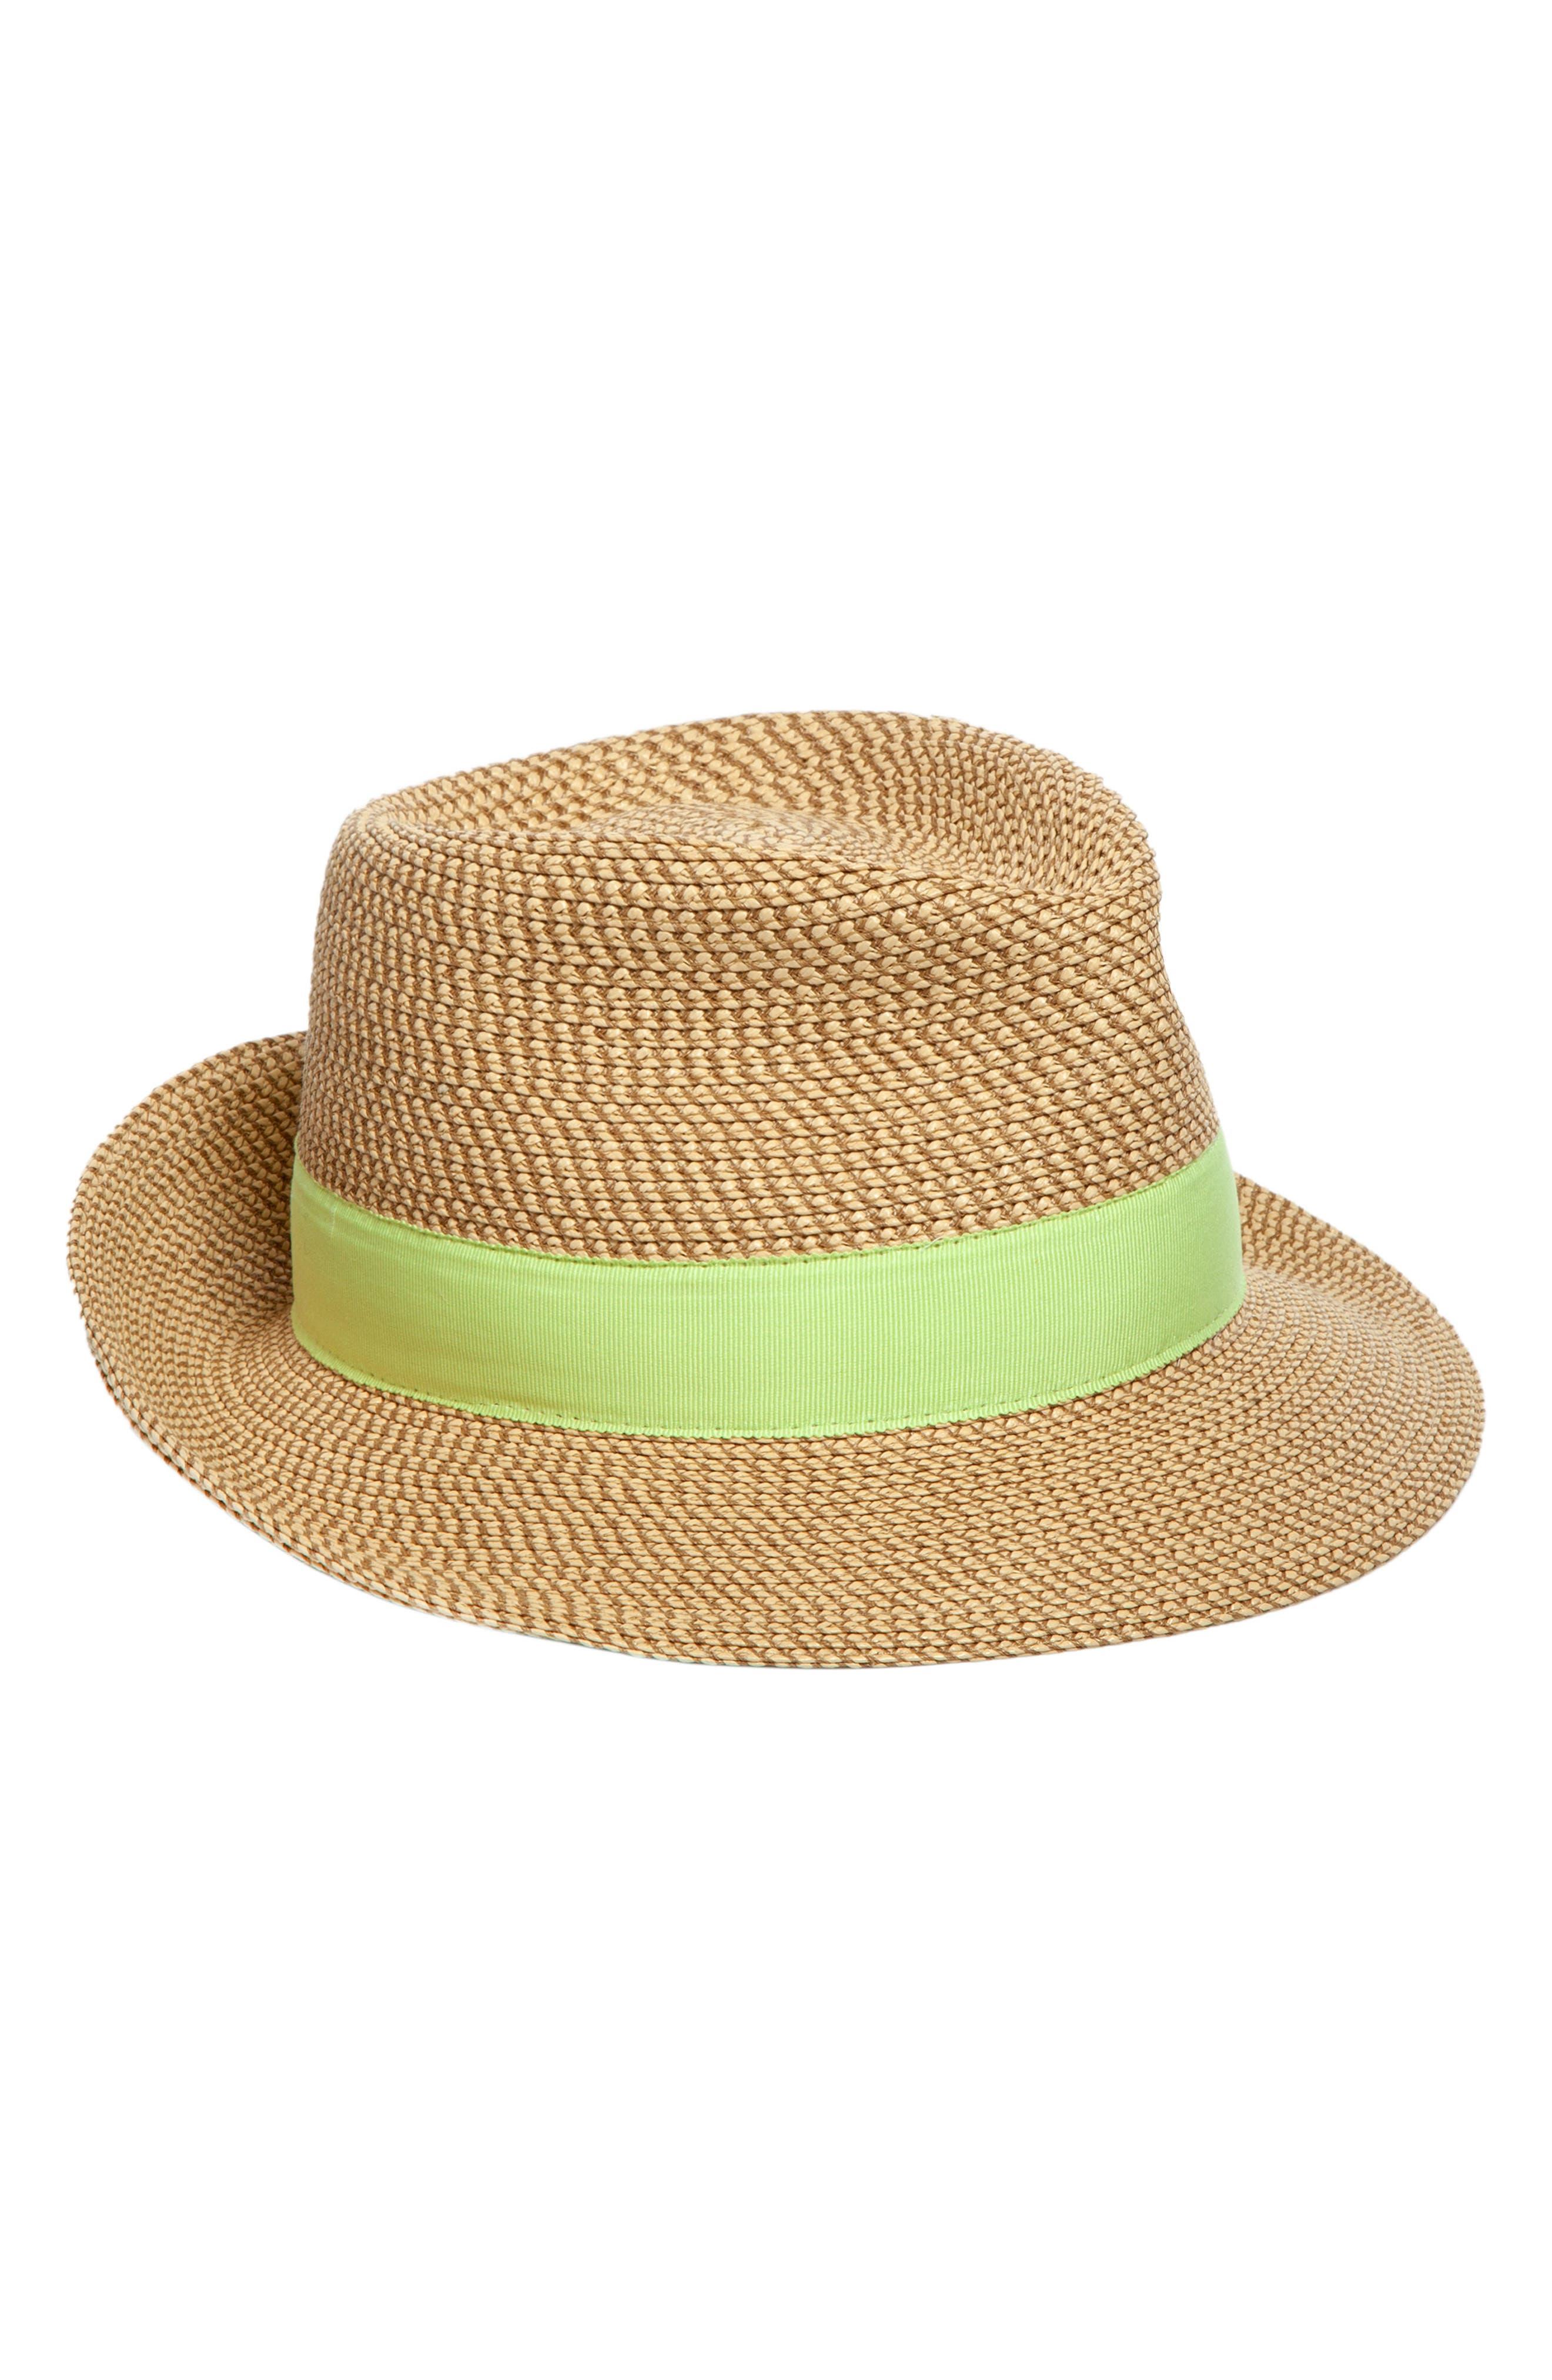 Classic Squishee<sup>®</sup> Packable Fedora Sun Hat,                         Main,                         color, PEANUT/ CITRON